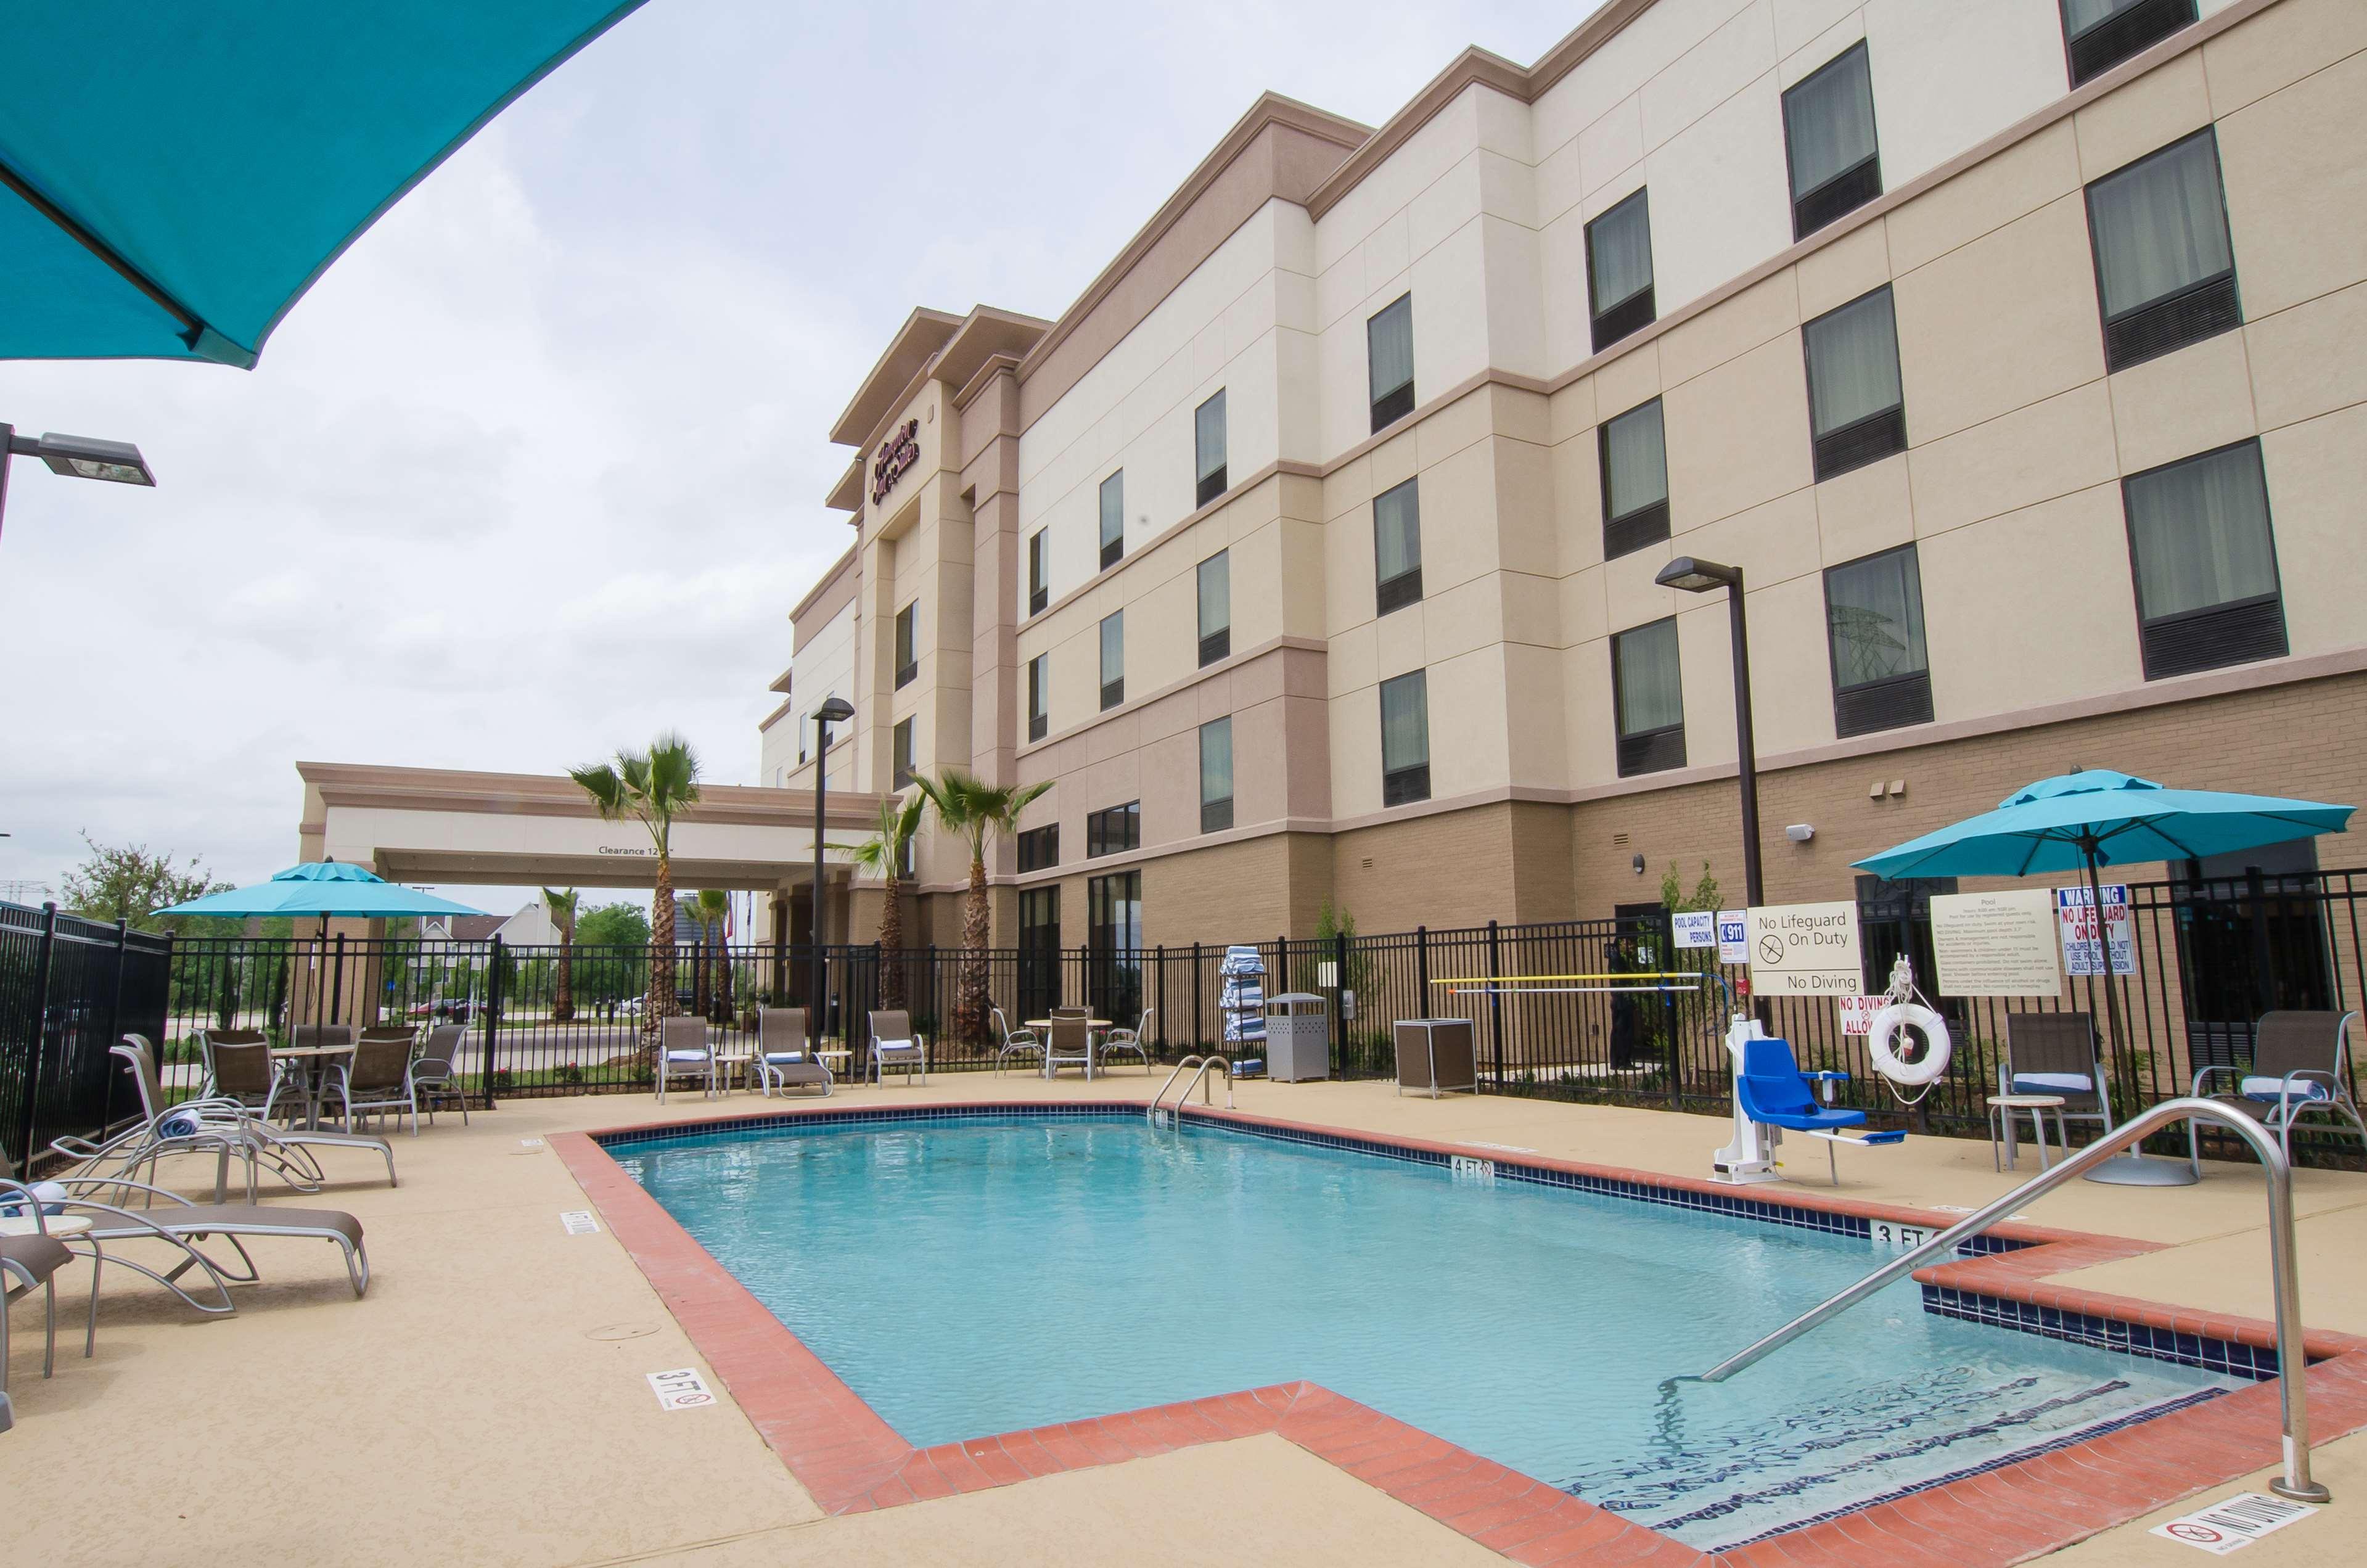 Hampton Inn & Suites Houston North IAH image 6